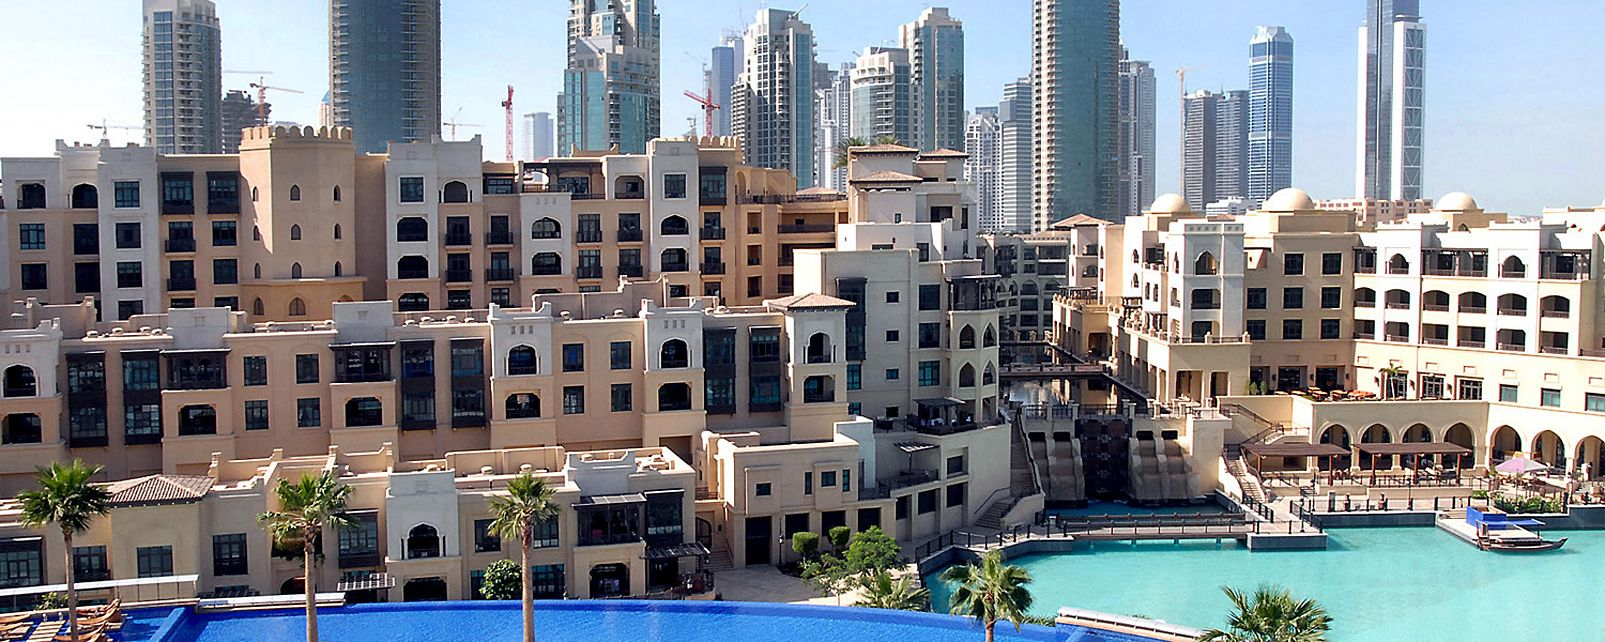 Hôtel The Address Downtown